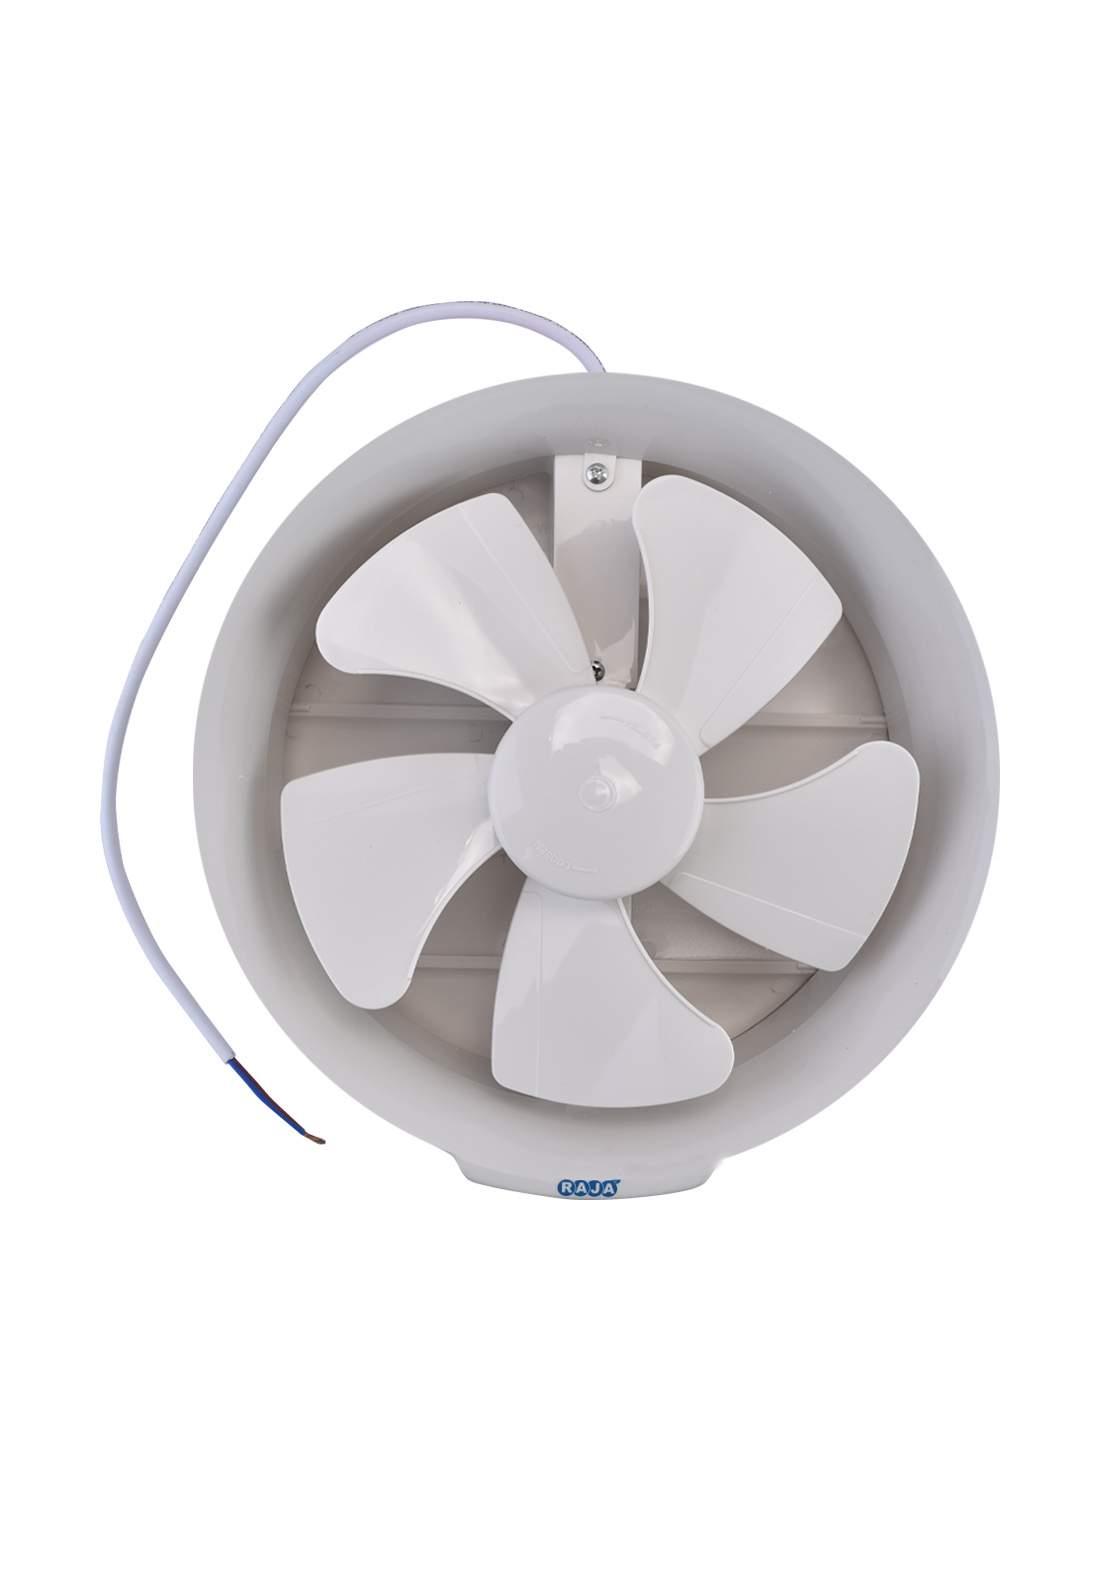 Raja VF-SC15 Ventilating Fans Auto Shutter 15 cm مفرغة هواء